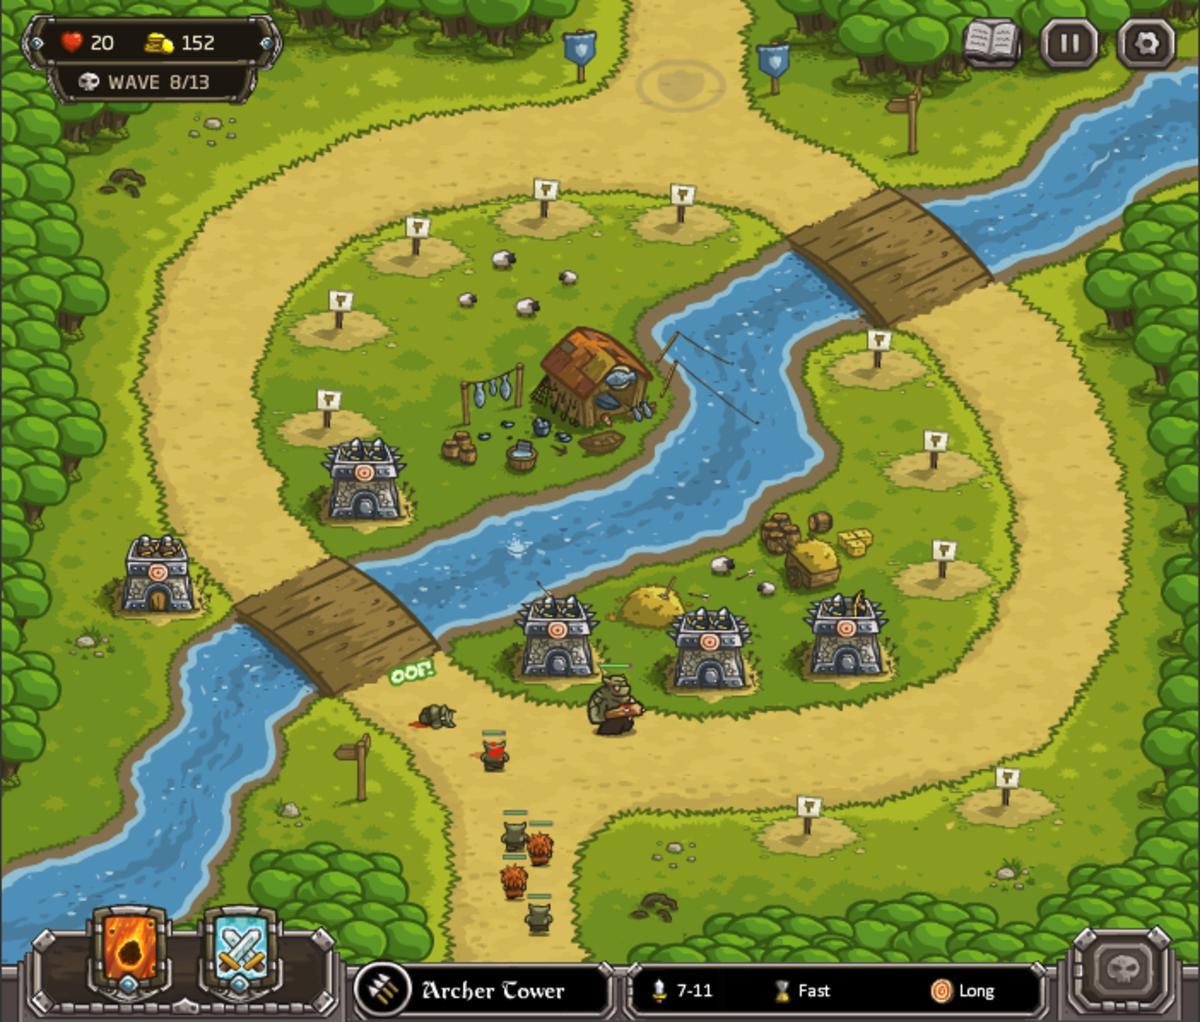 Kingdom Rush Walkthrough: Level 4 - Twin Rivers